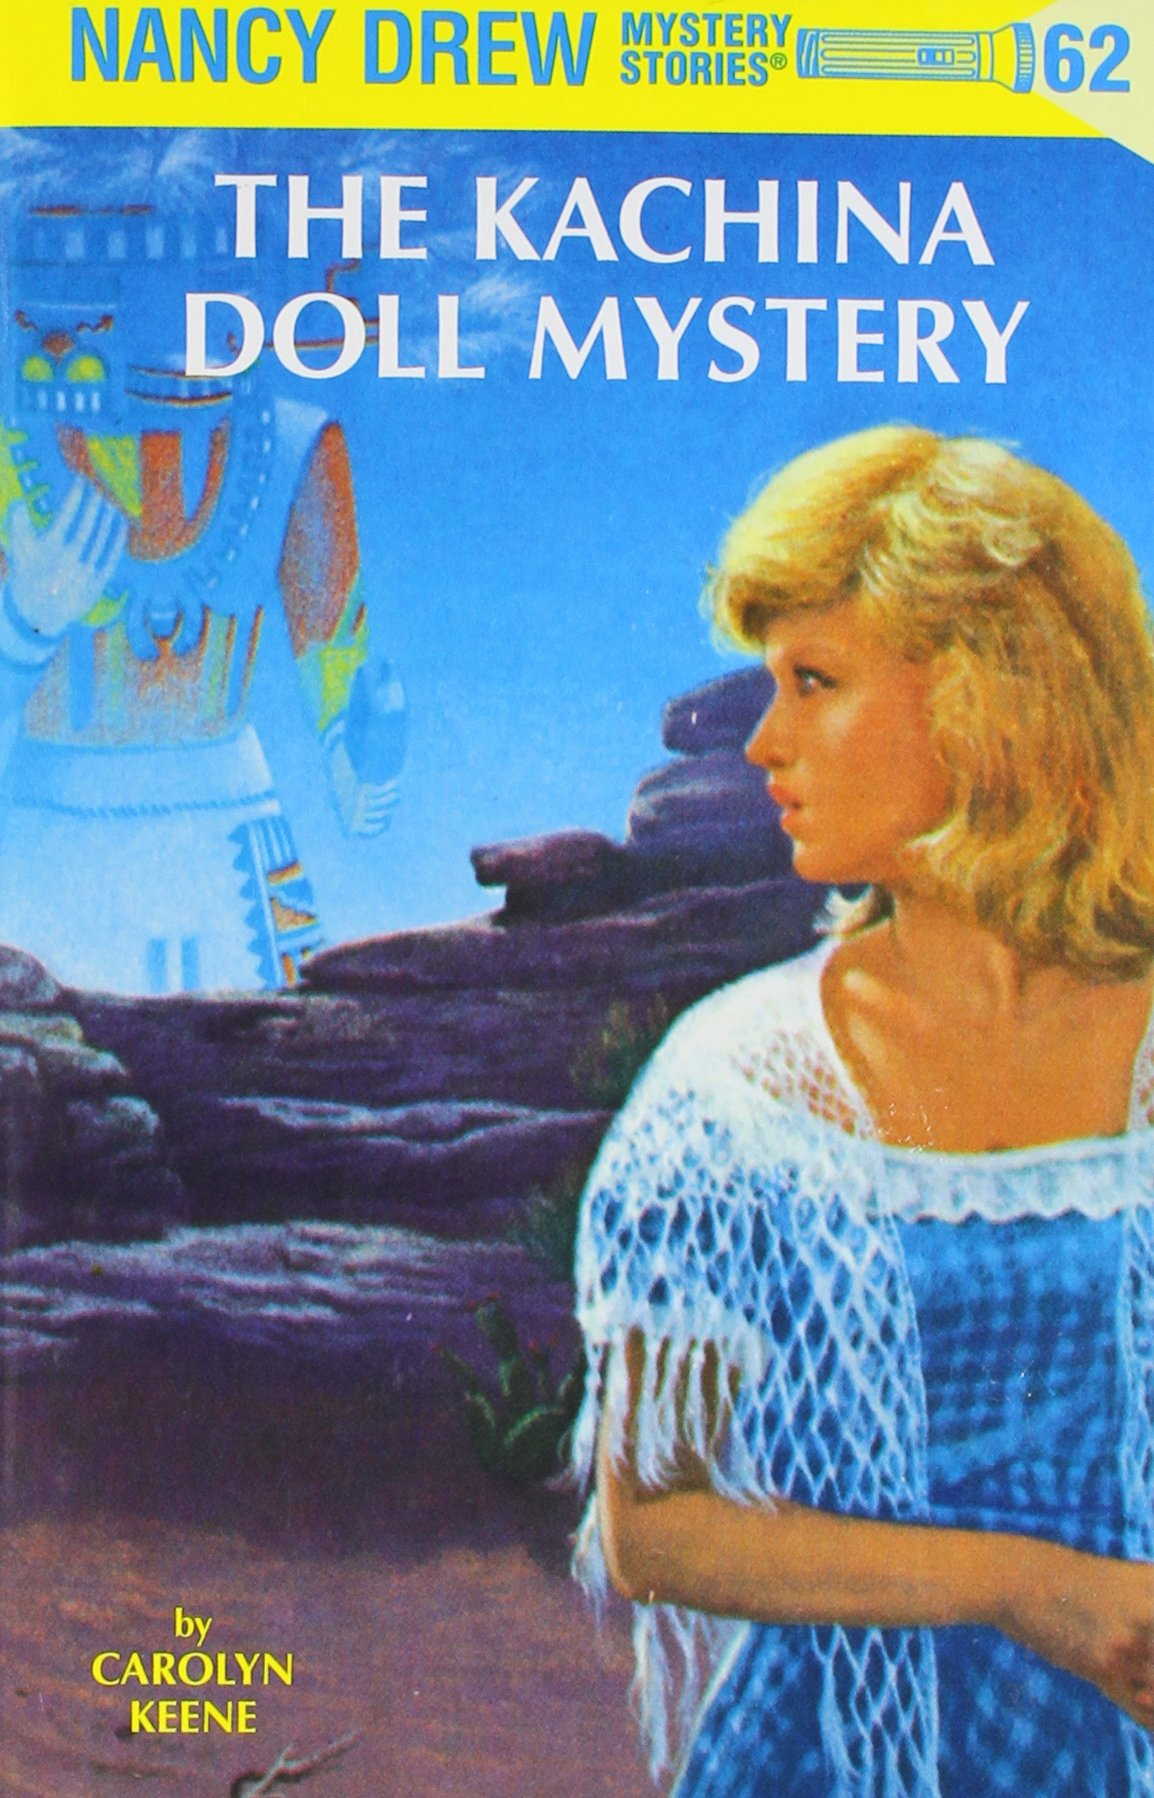 Nancy Drew 62: The Kachina Doll Mystery by Grosset & Dunlap